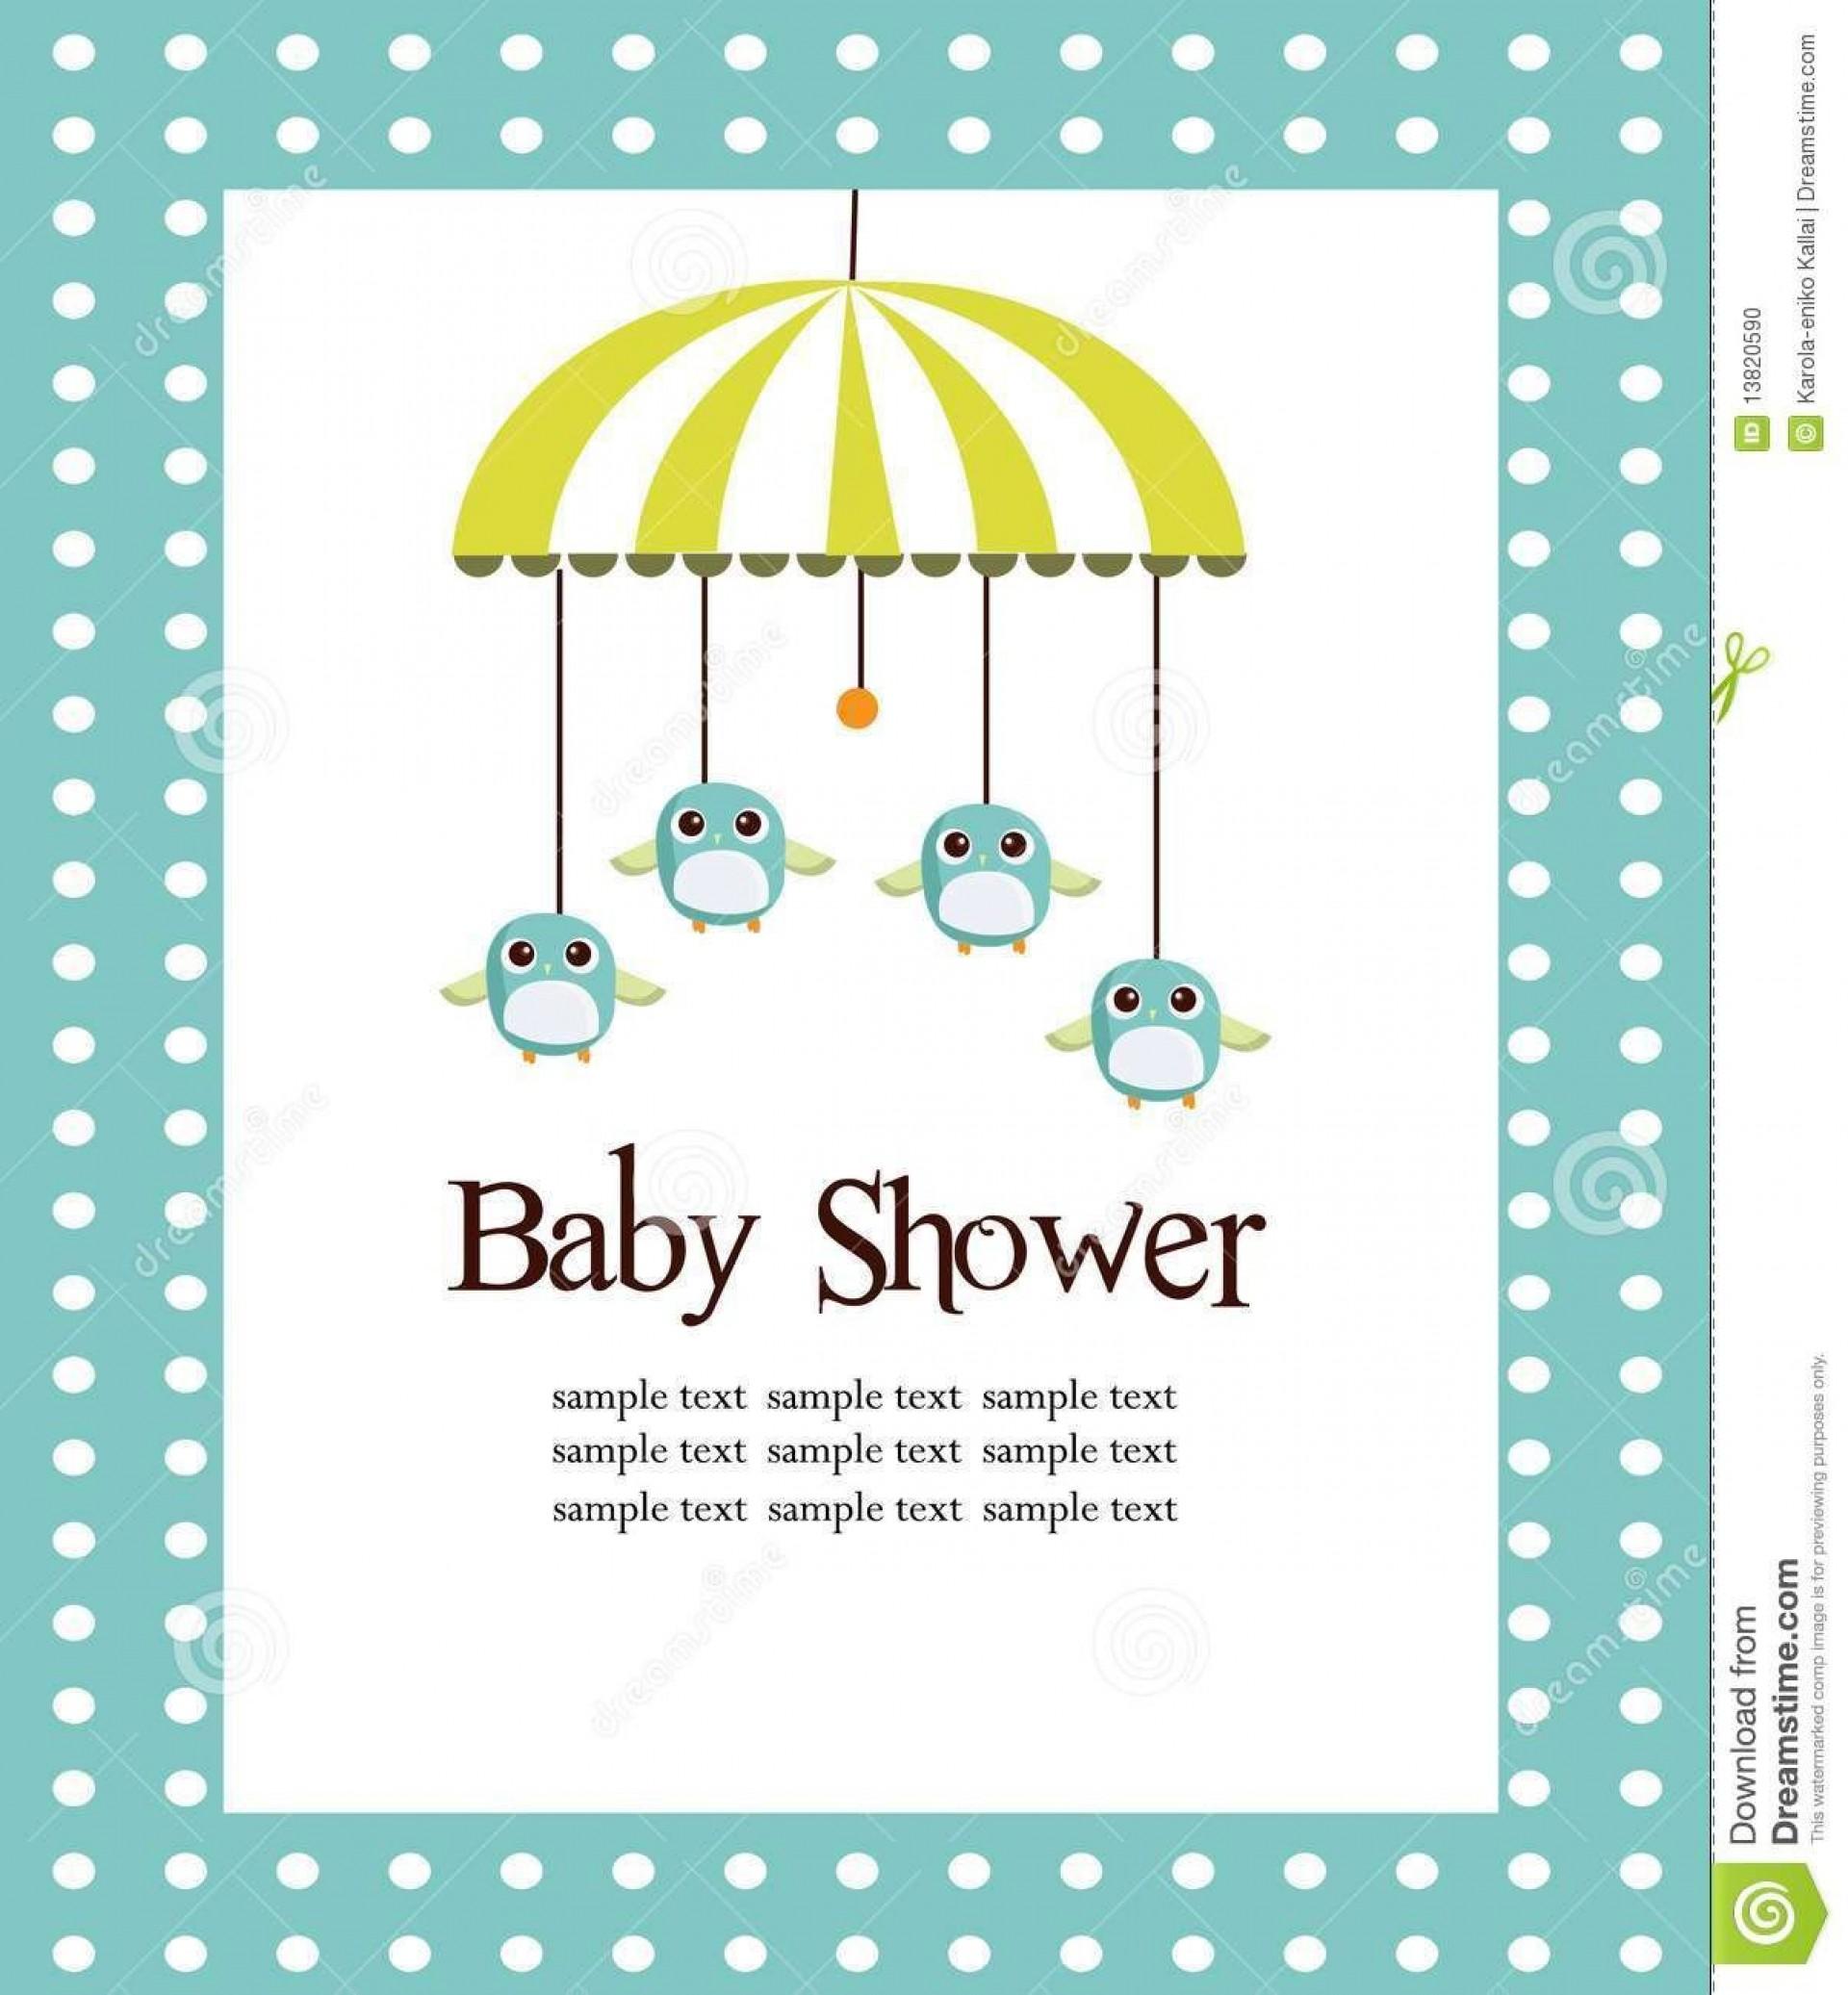 008 Impressive Free Printable Baby Shower Card For Boy Highest Quality  Bingo1920